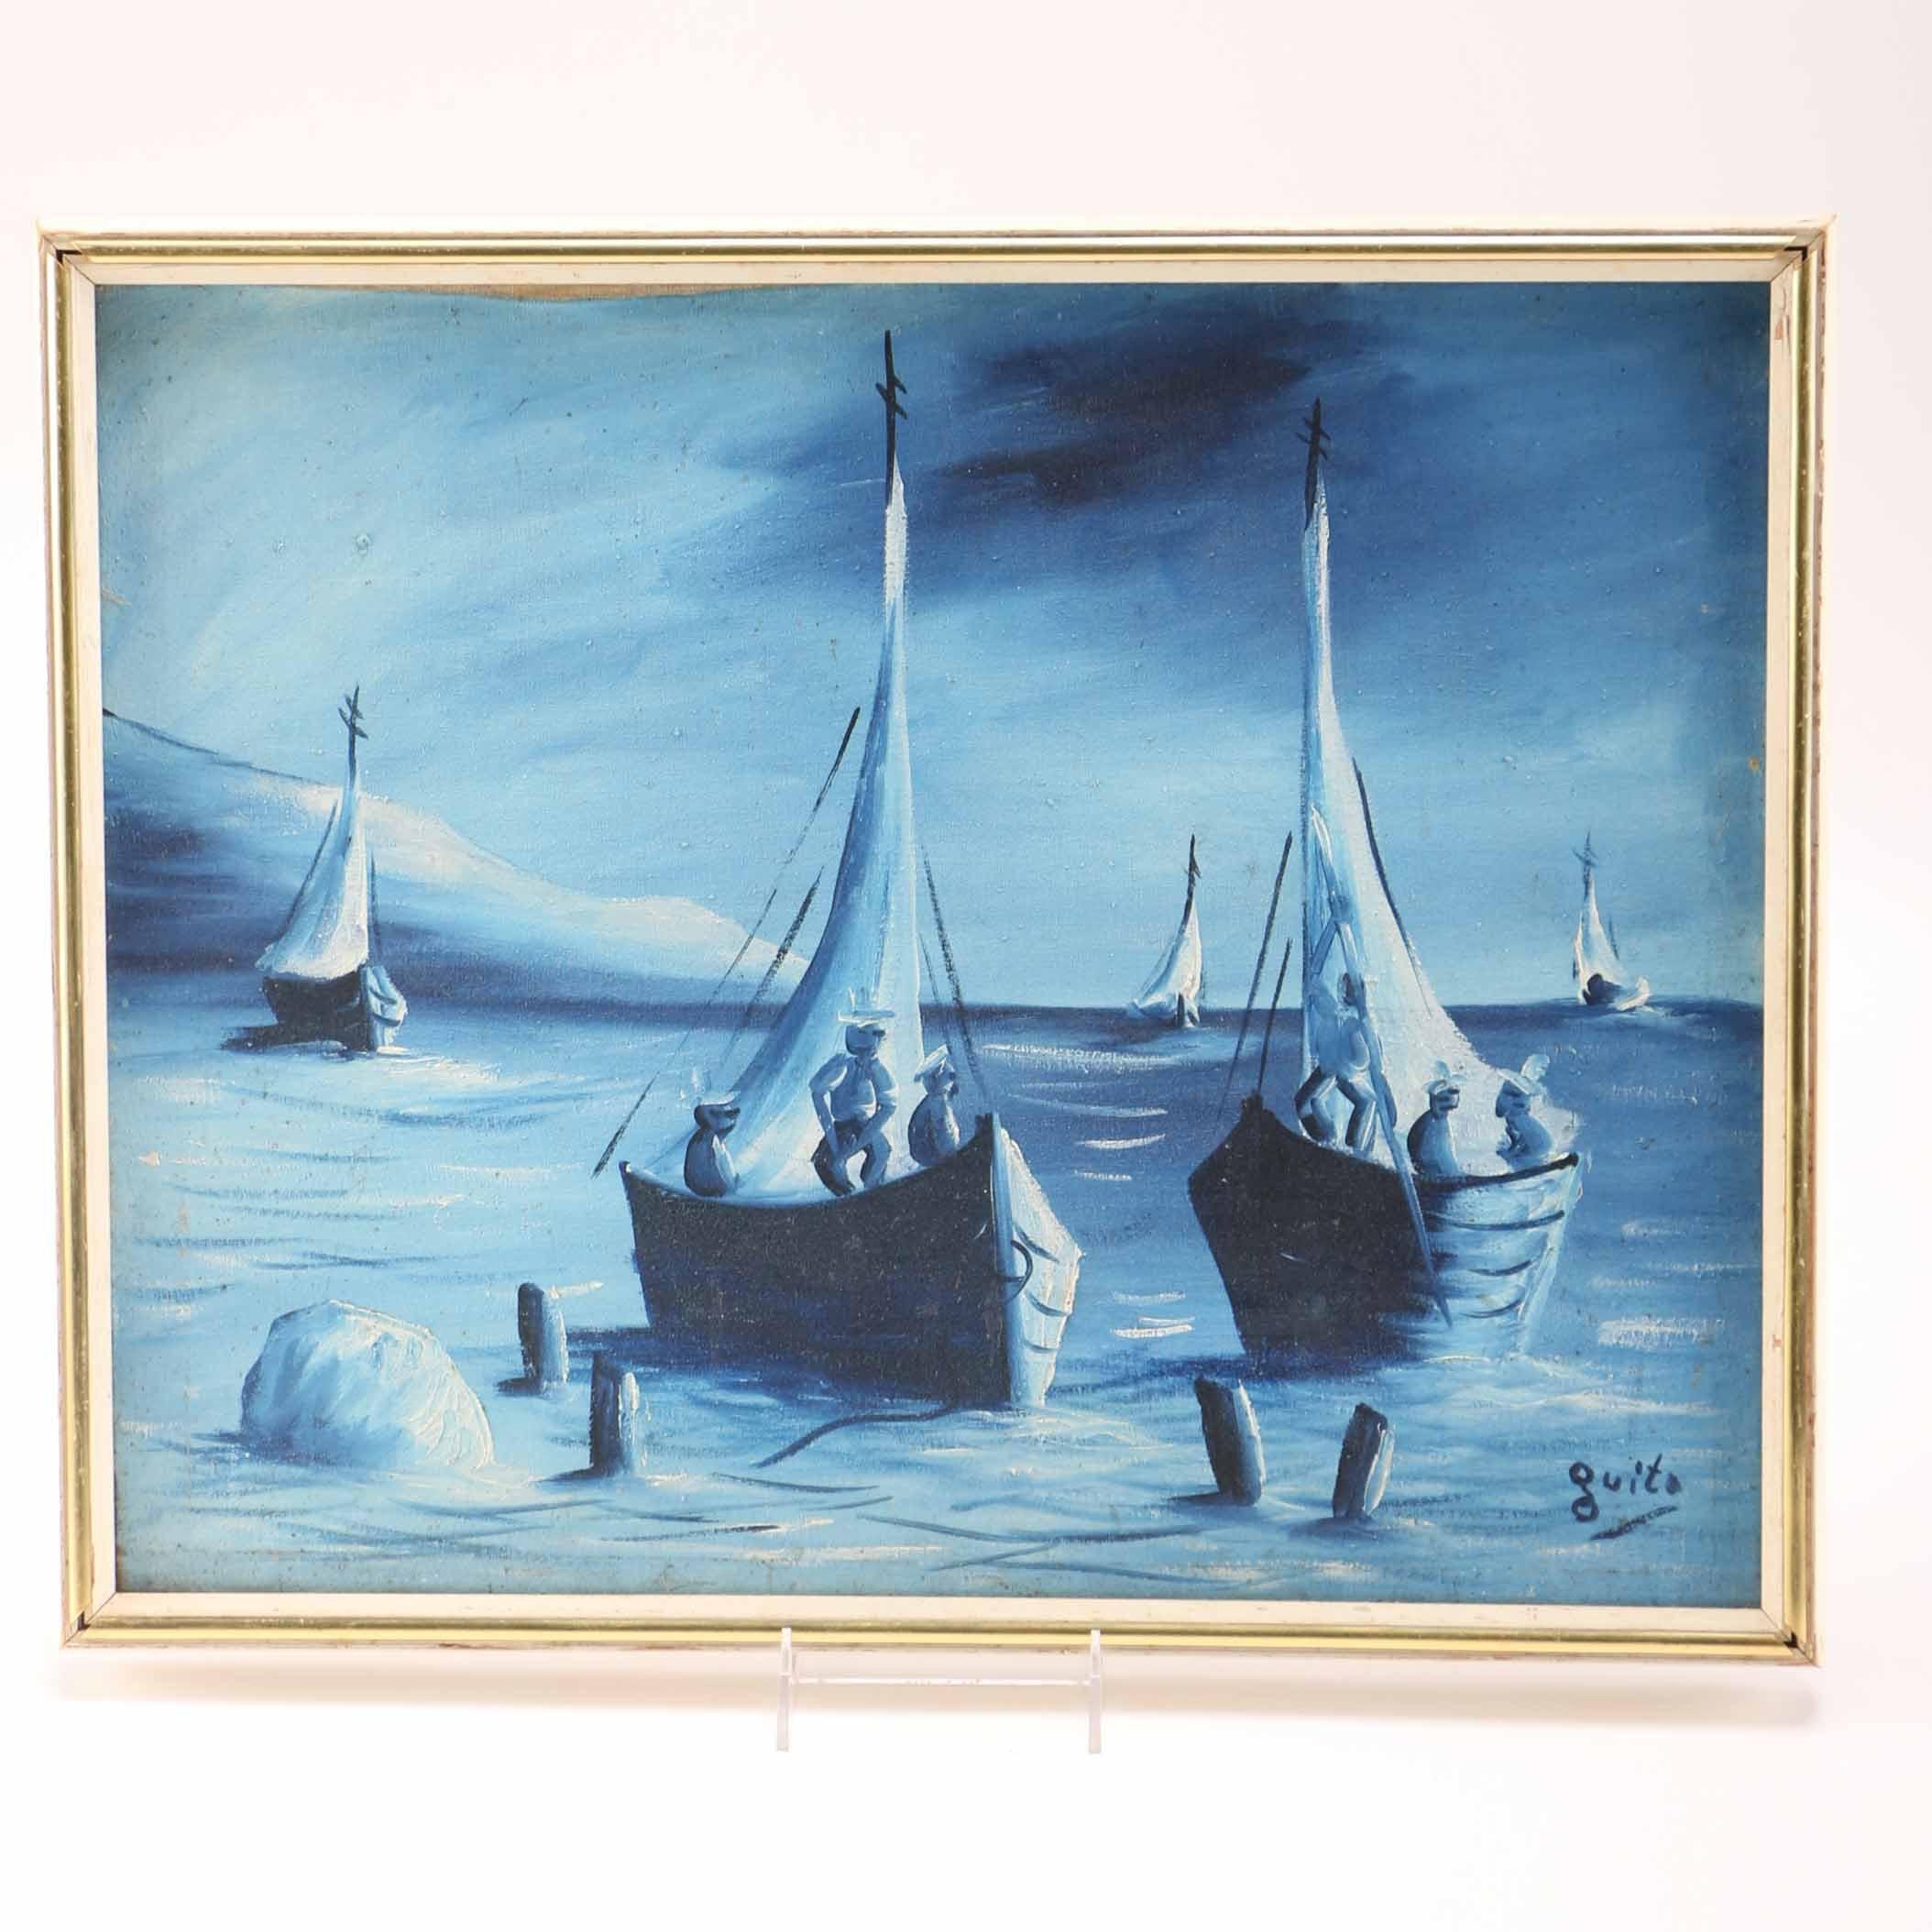 Quito Signed Original Painting of Sailboats